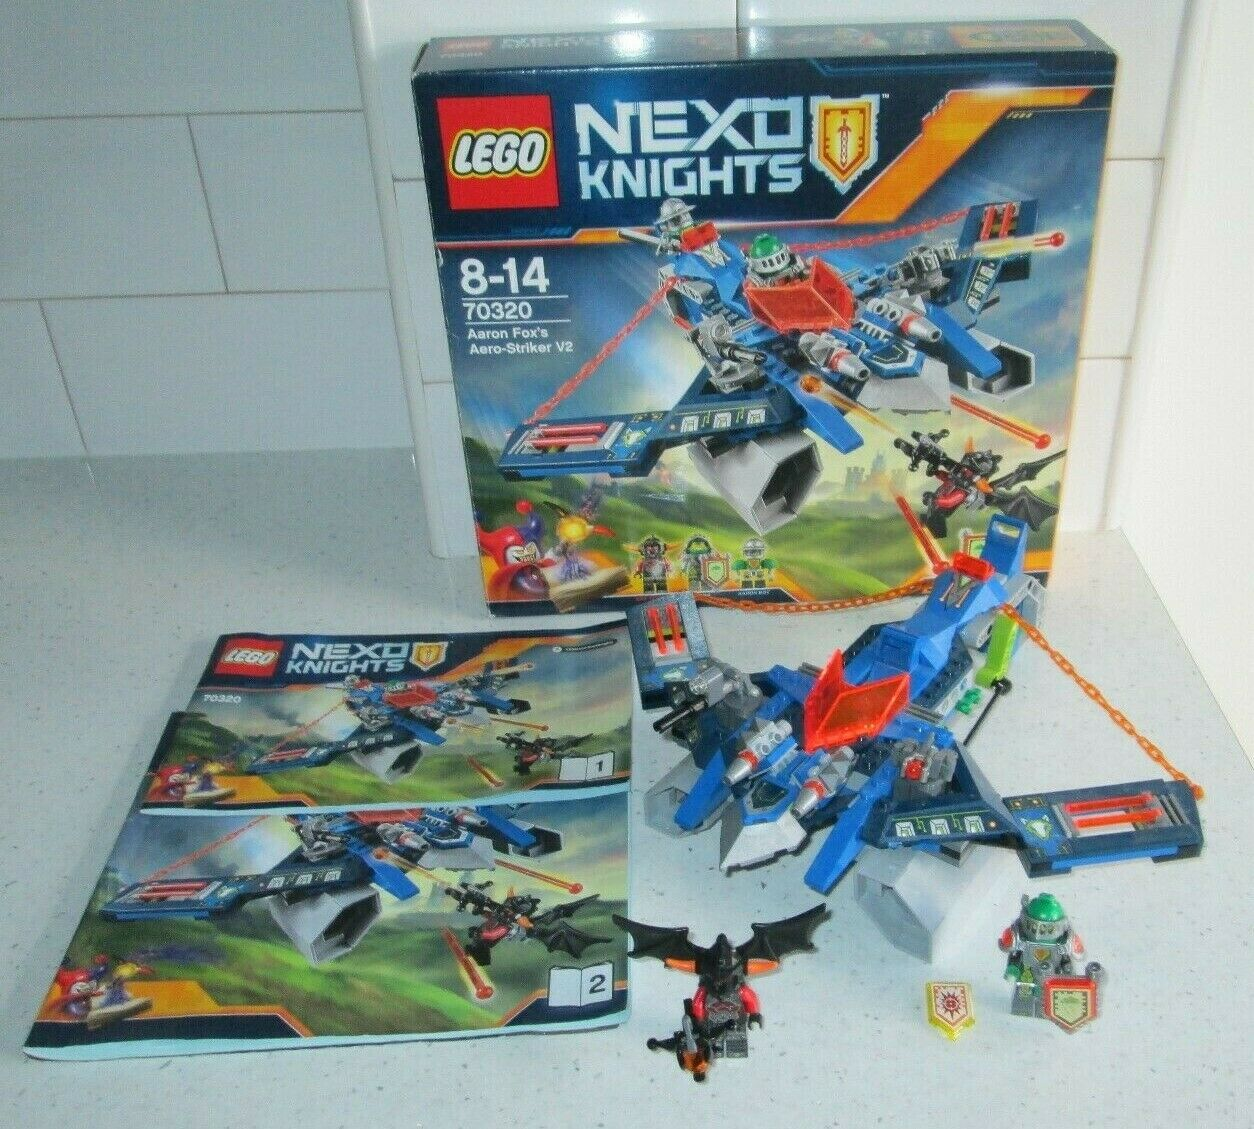 LEGO NEXO KNIGHTS SET 70320 AARON FOX'S AERO-STRIKER V2